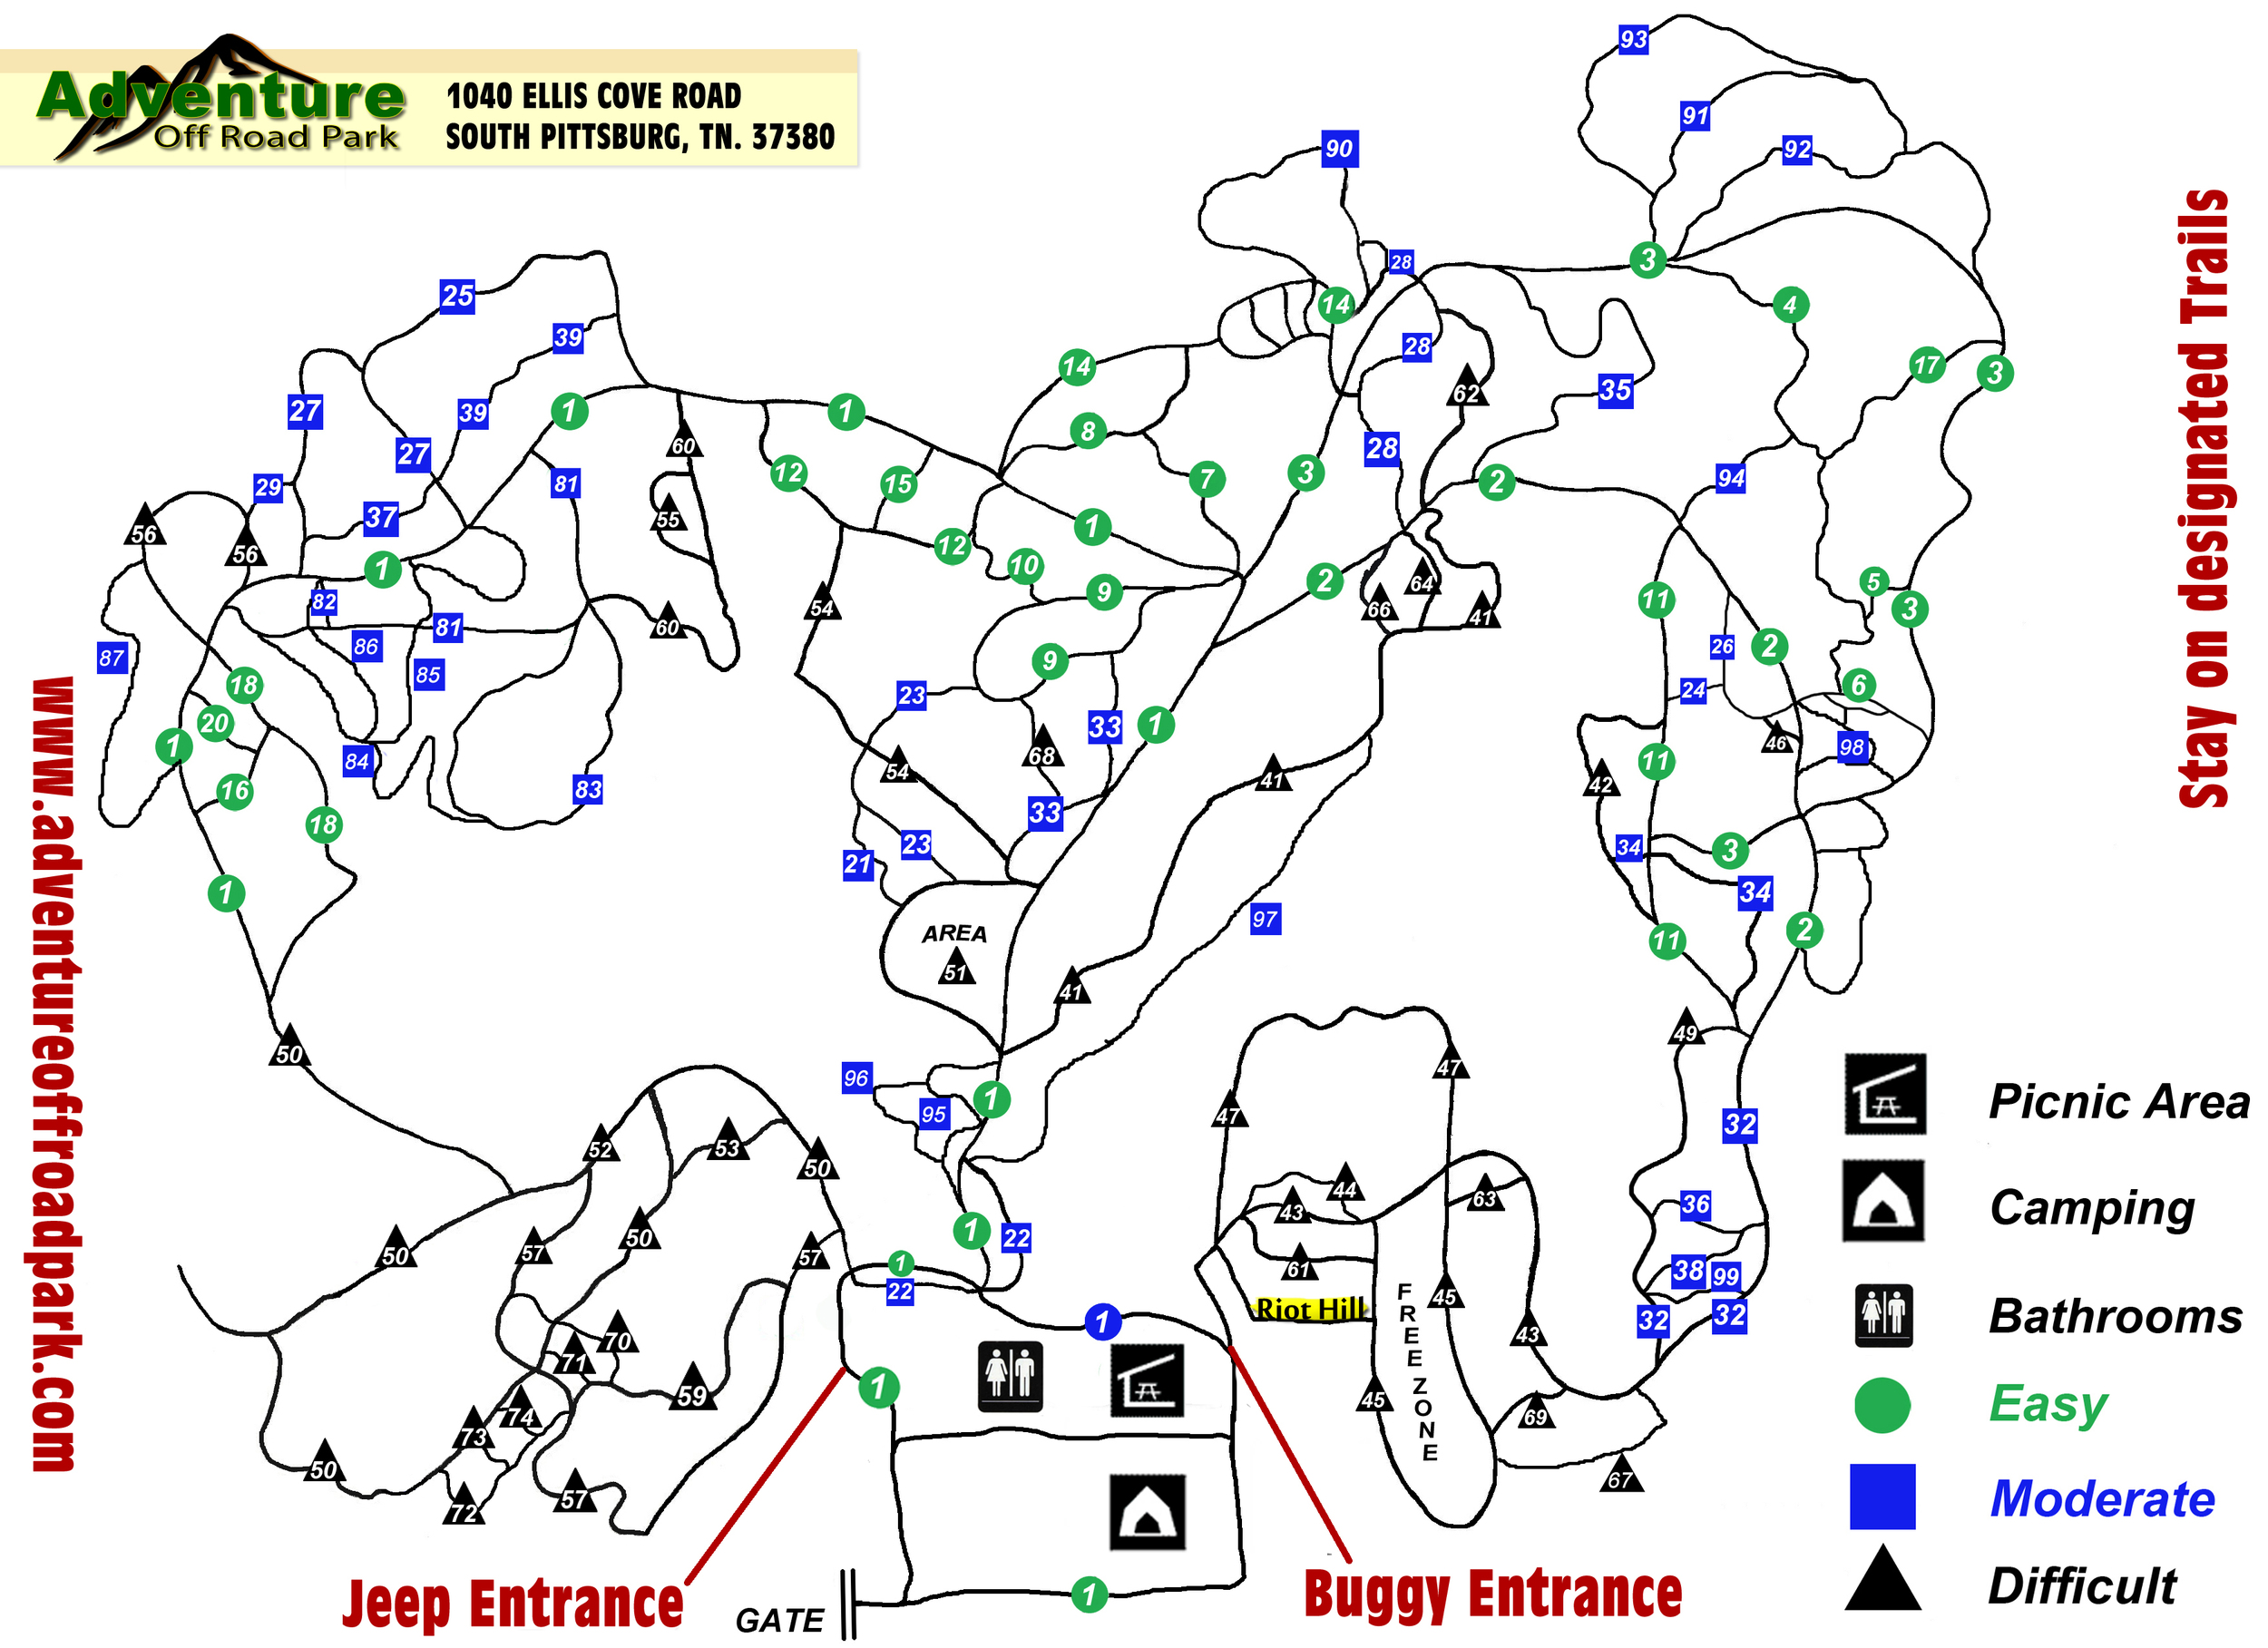 Current AOP Trail Map